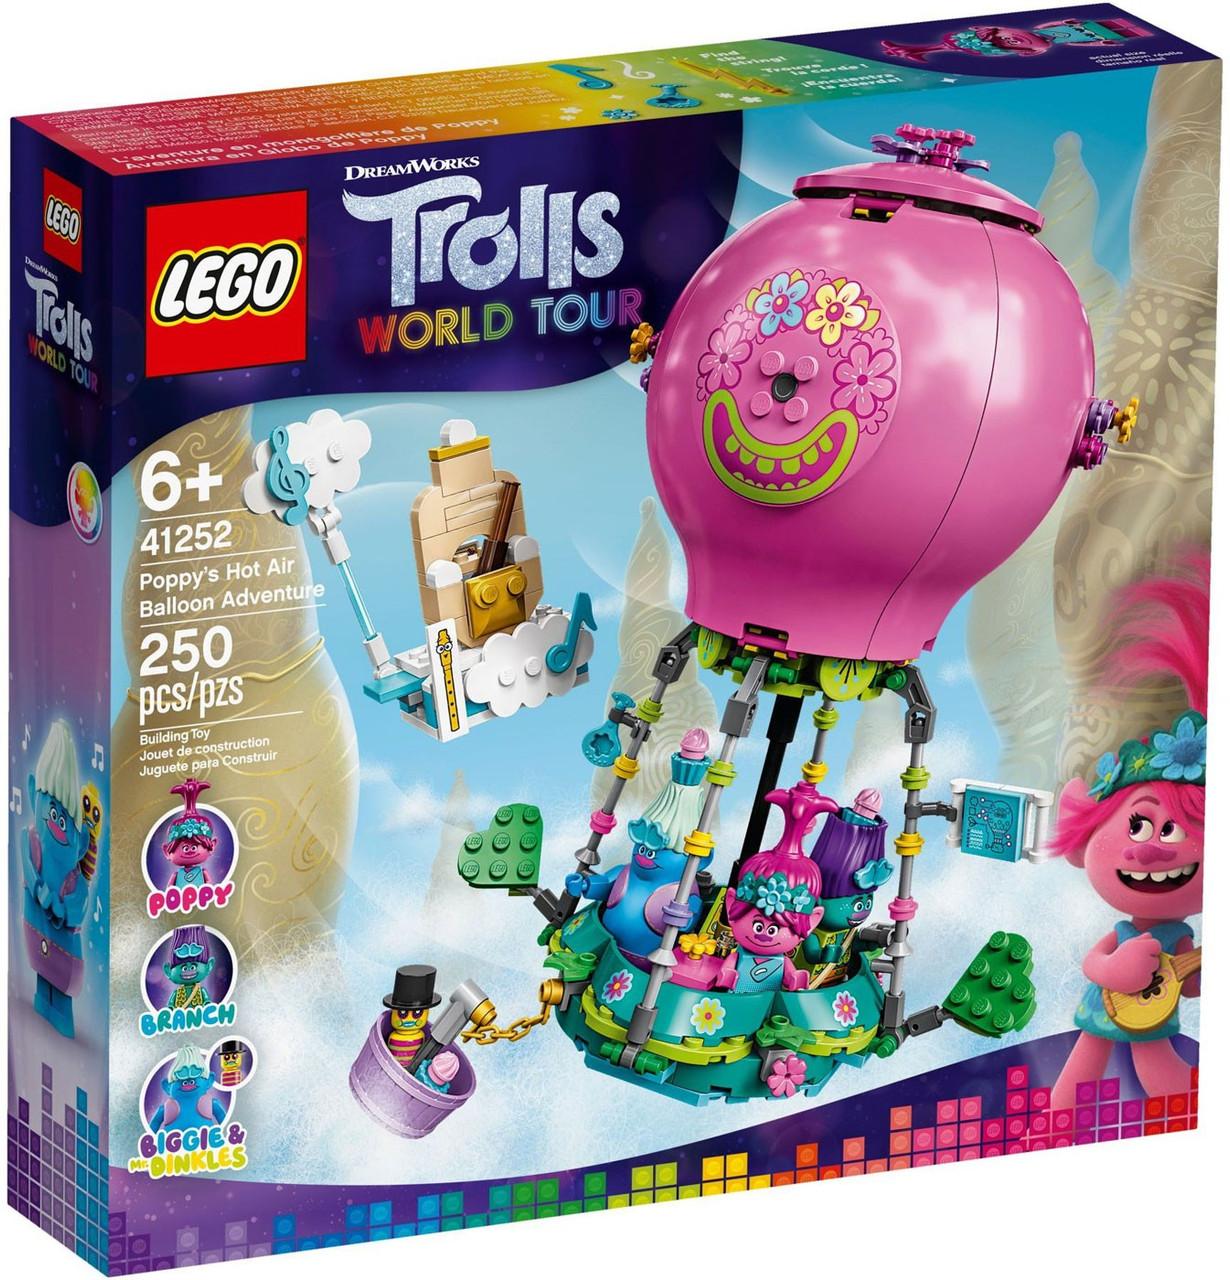 Lego Trolls World Tour Poppys Hot Air Balloon Adventure Set 41252